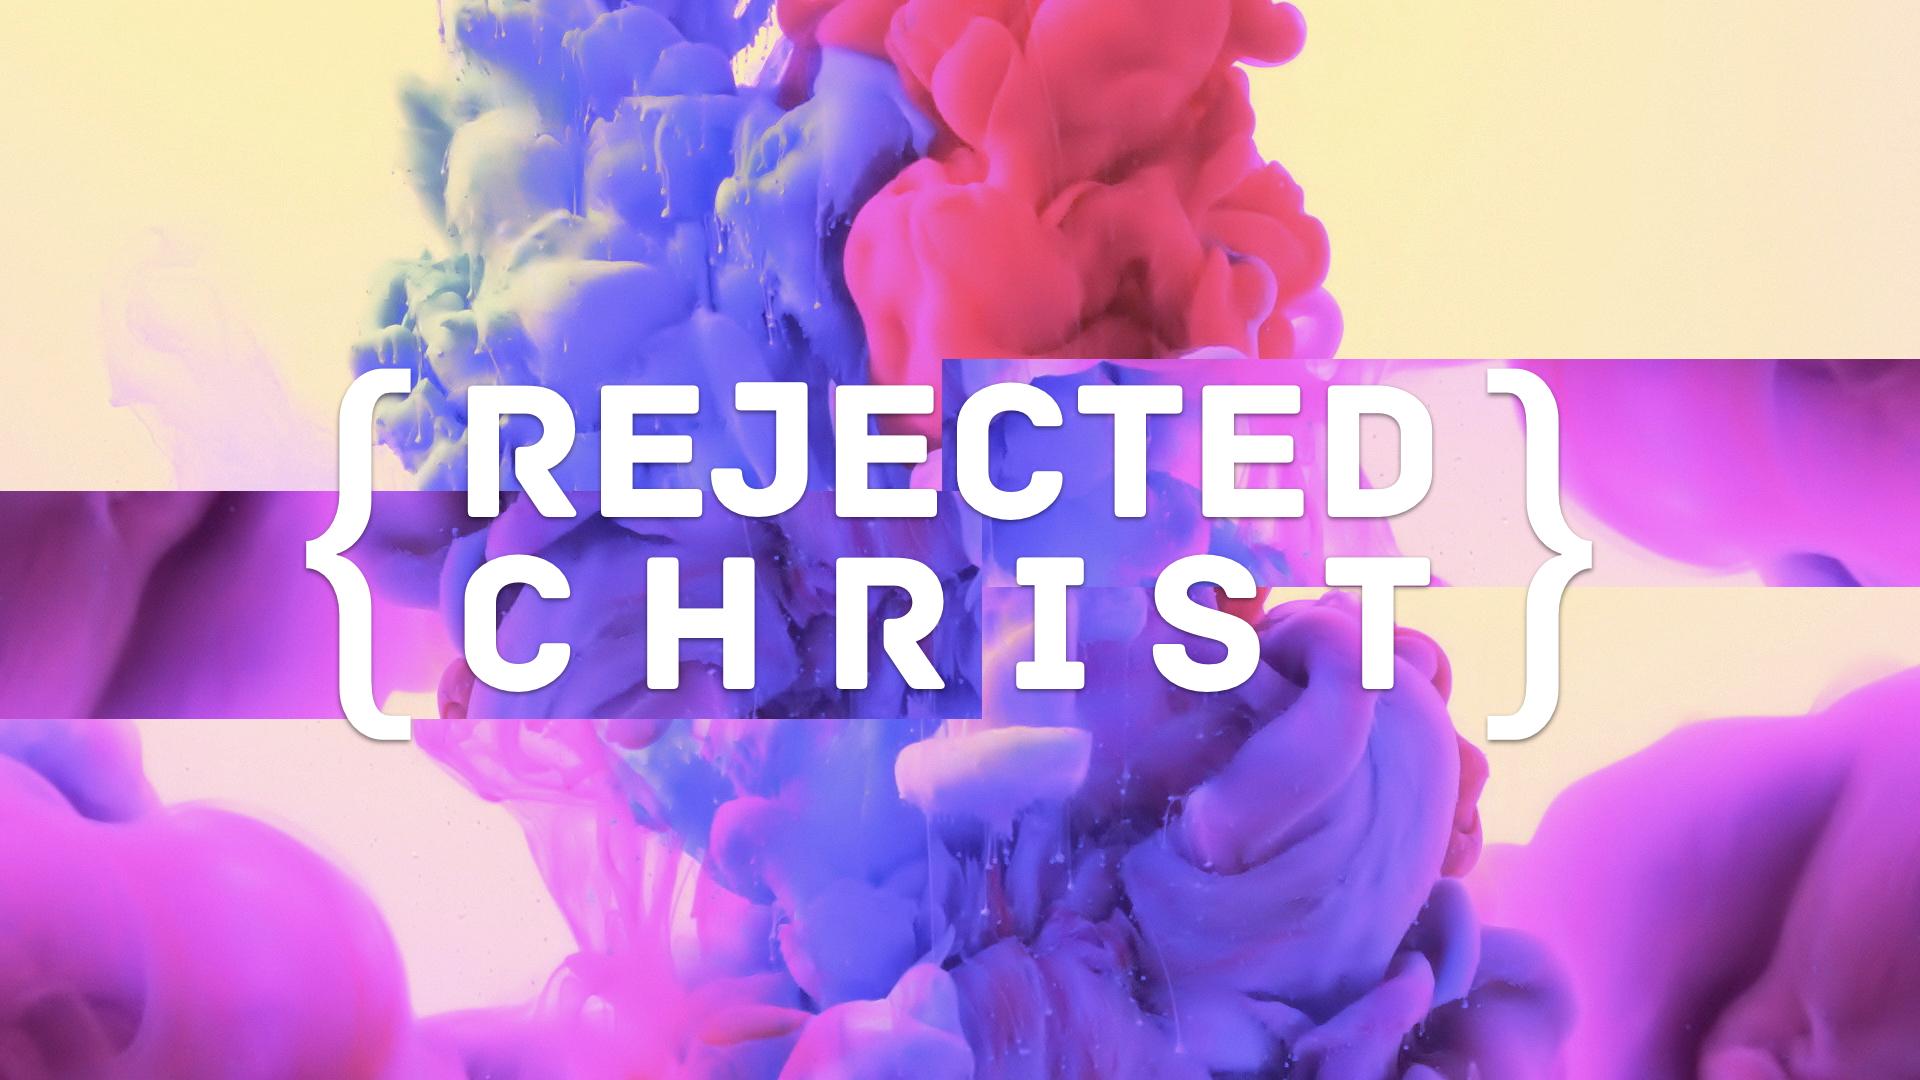 REJECTED_CHRIST.001.jpeg